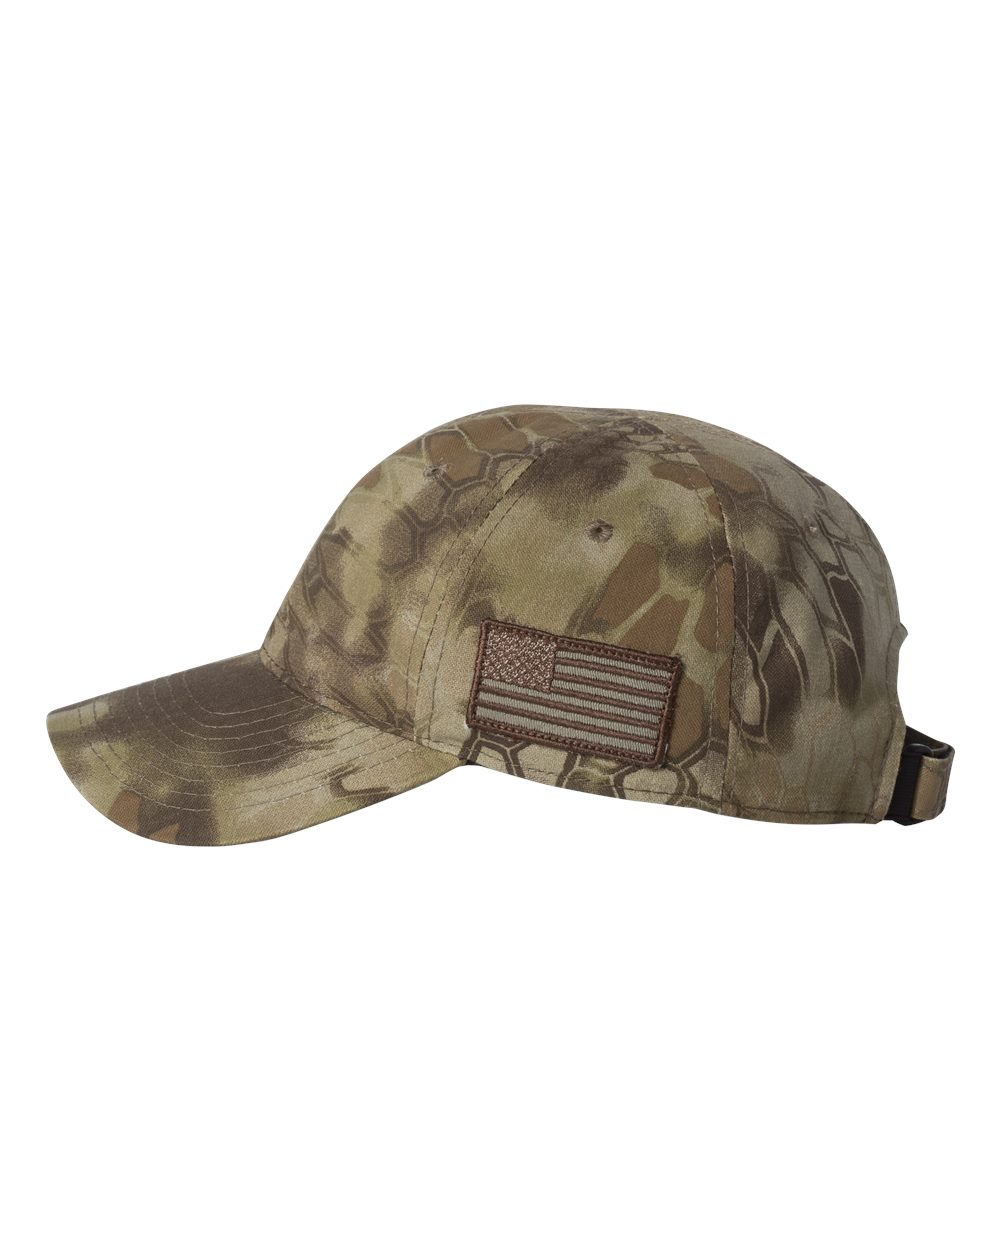 Outdoor Cap TAC600 - Kryptek Camo Cap